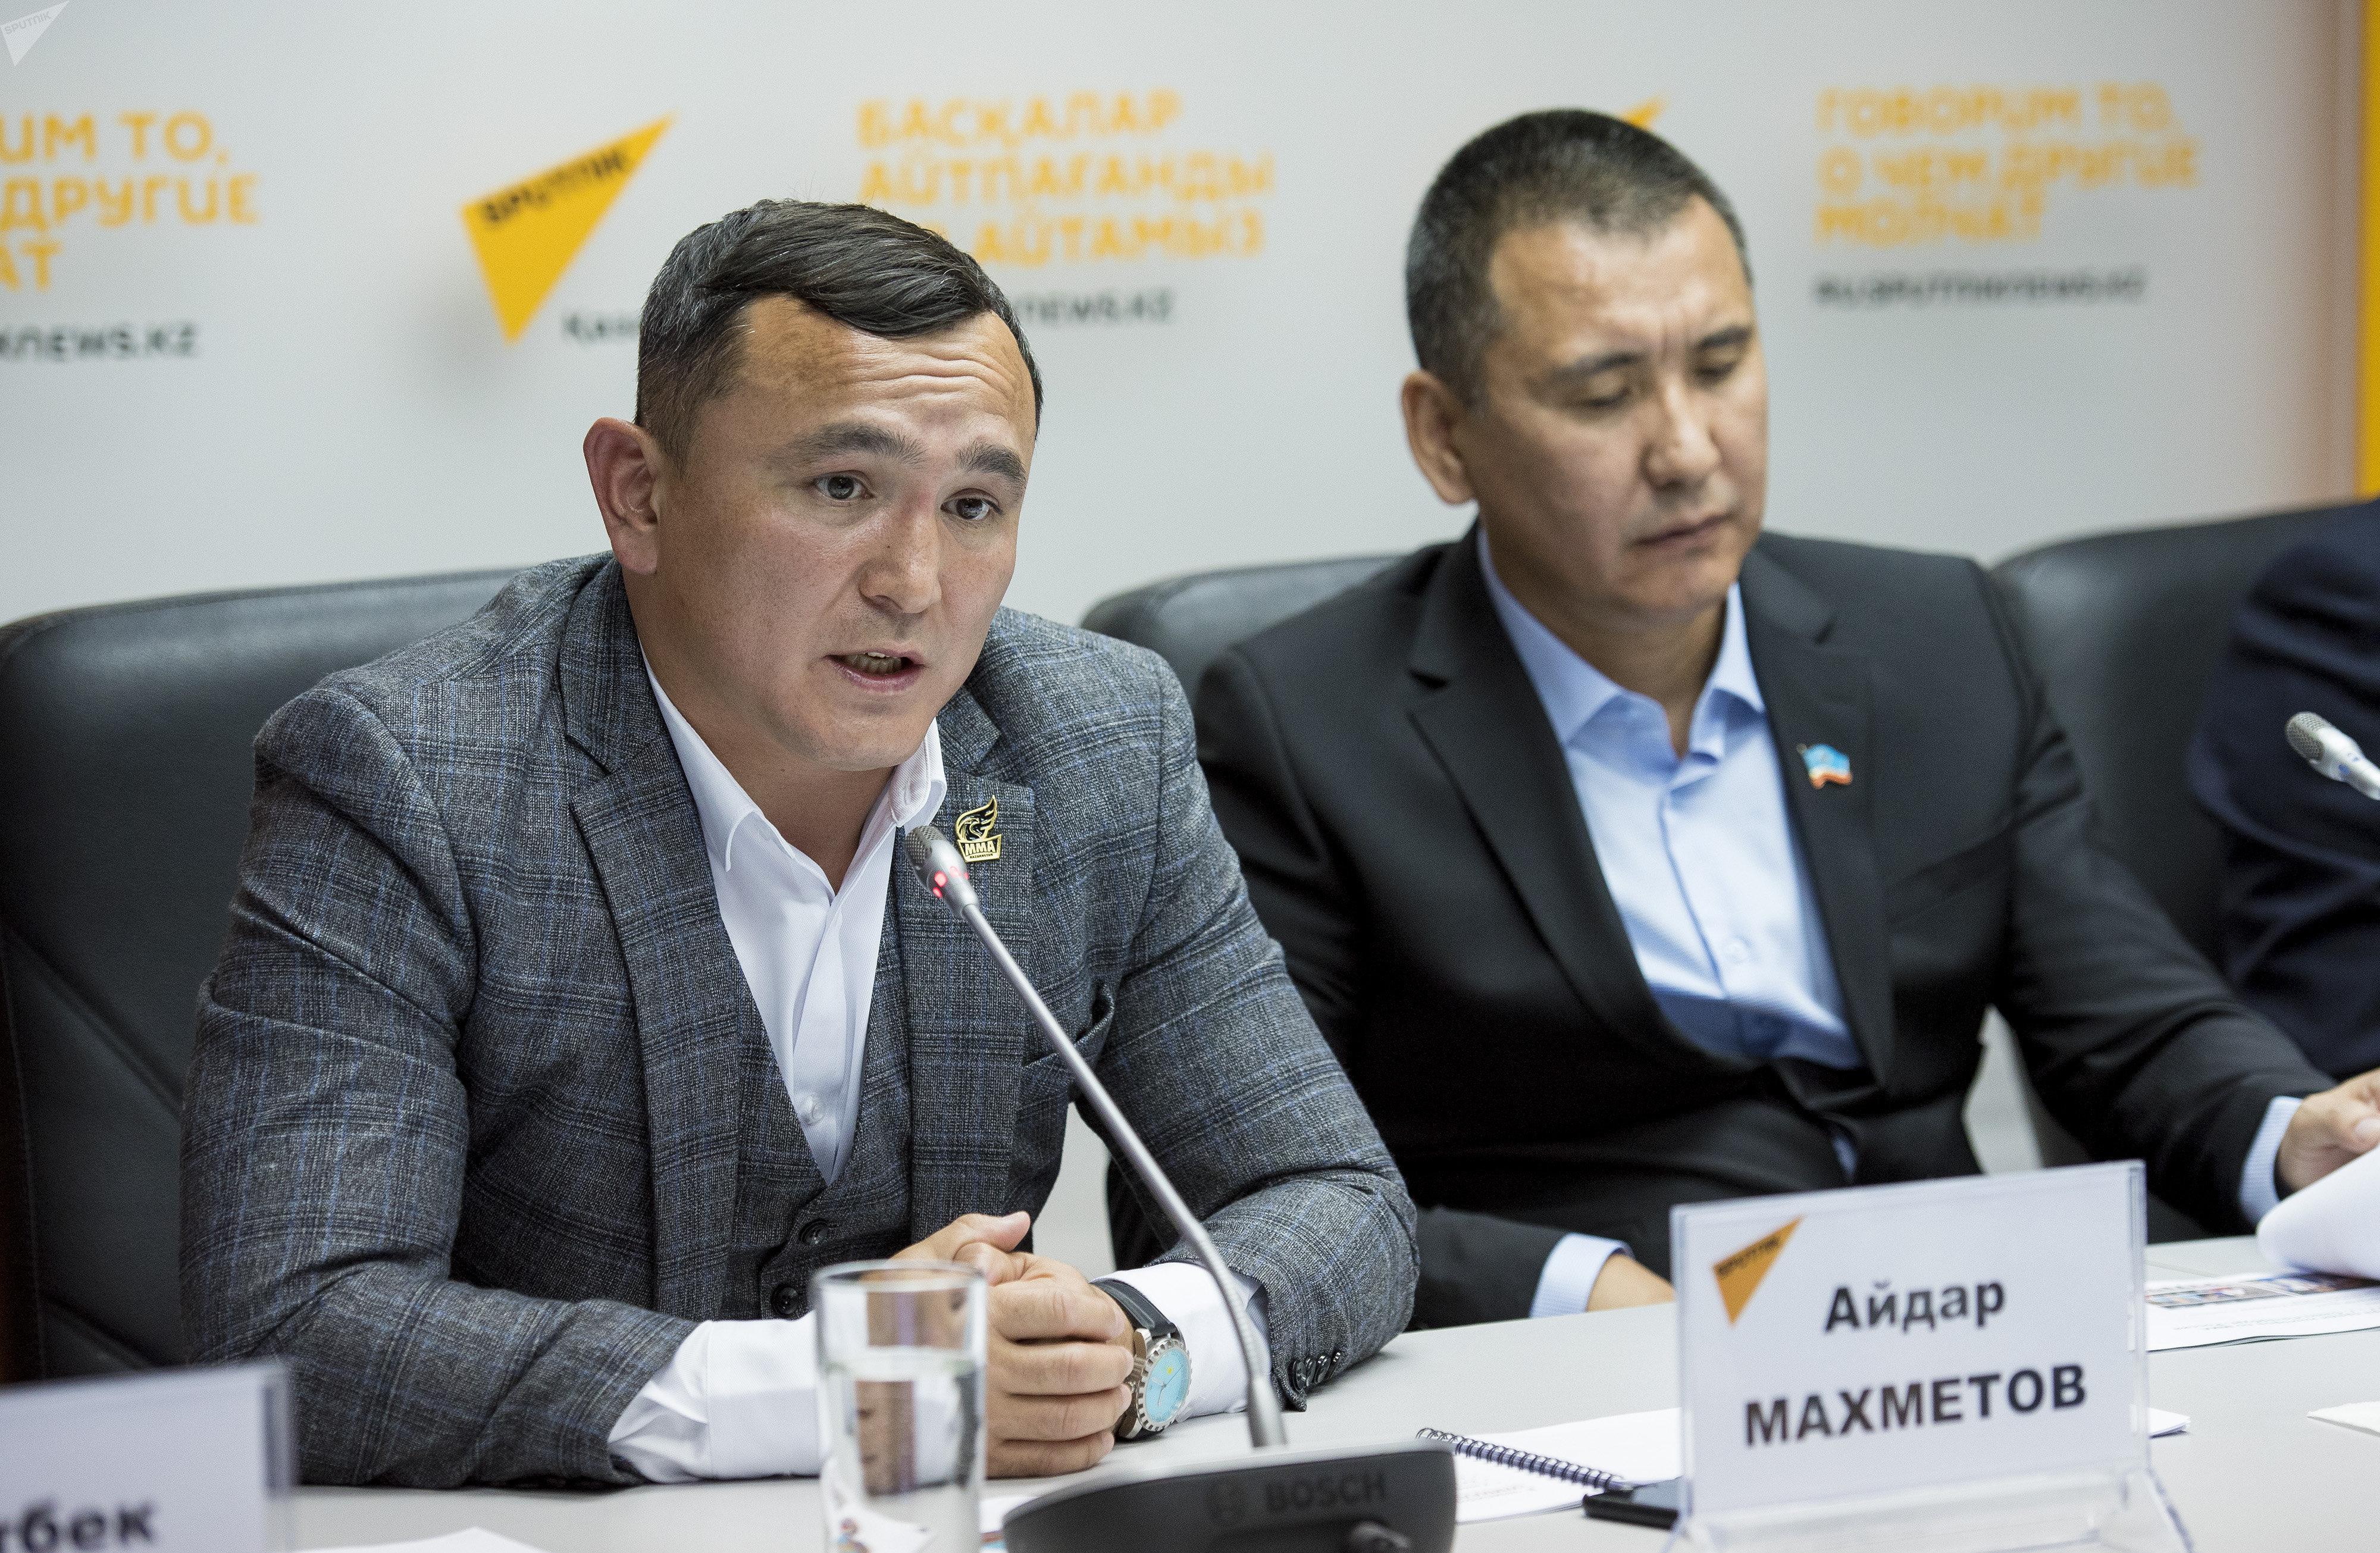 Айдар Махметов